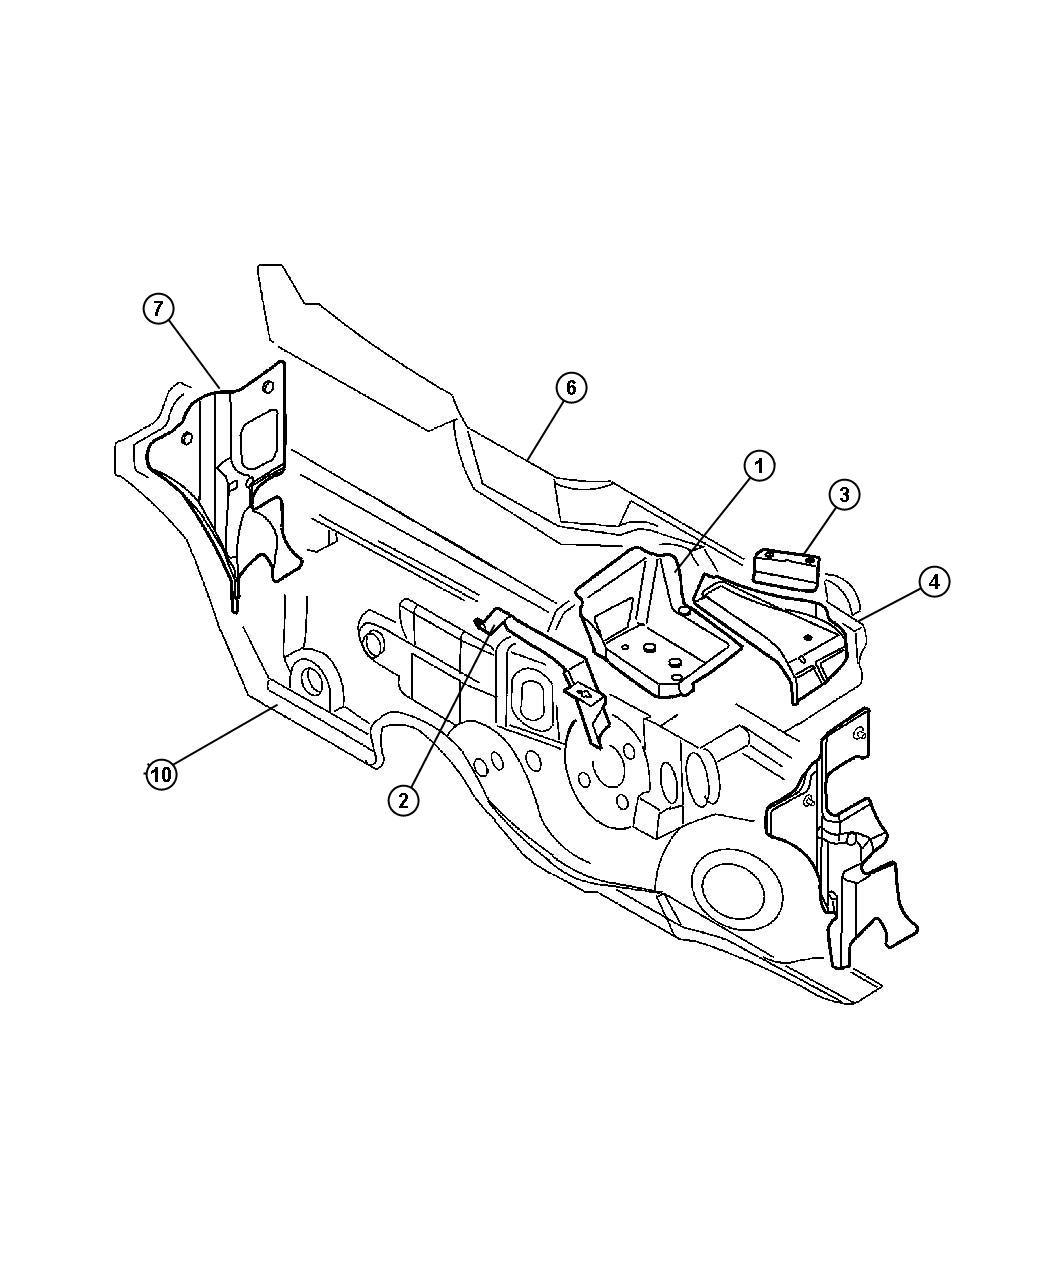 Jeep Wrangler Clip, nameplate, nut. Dash panel, silencer